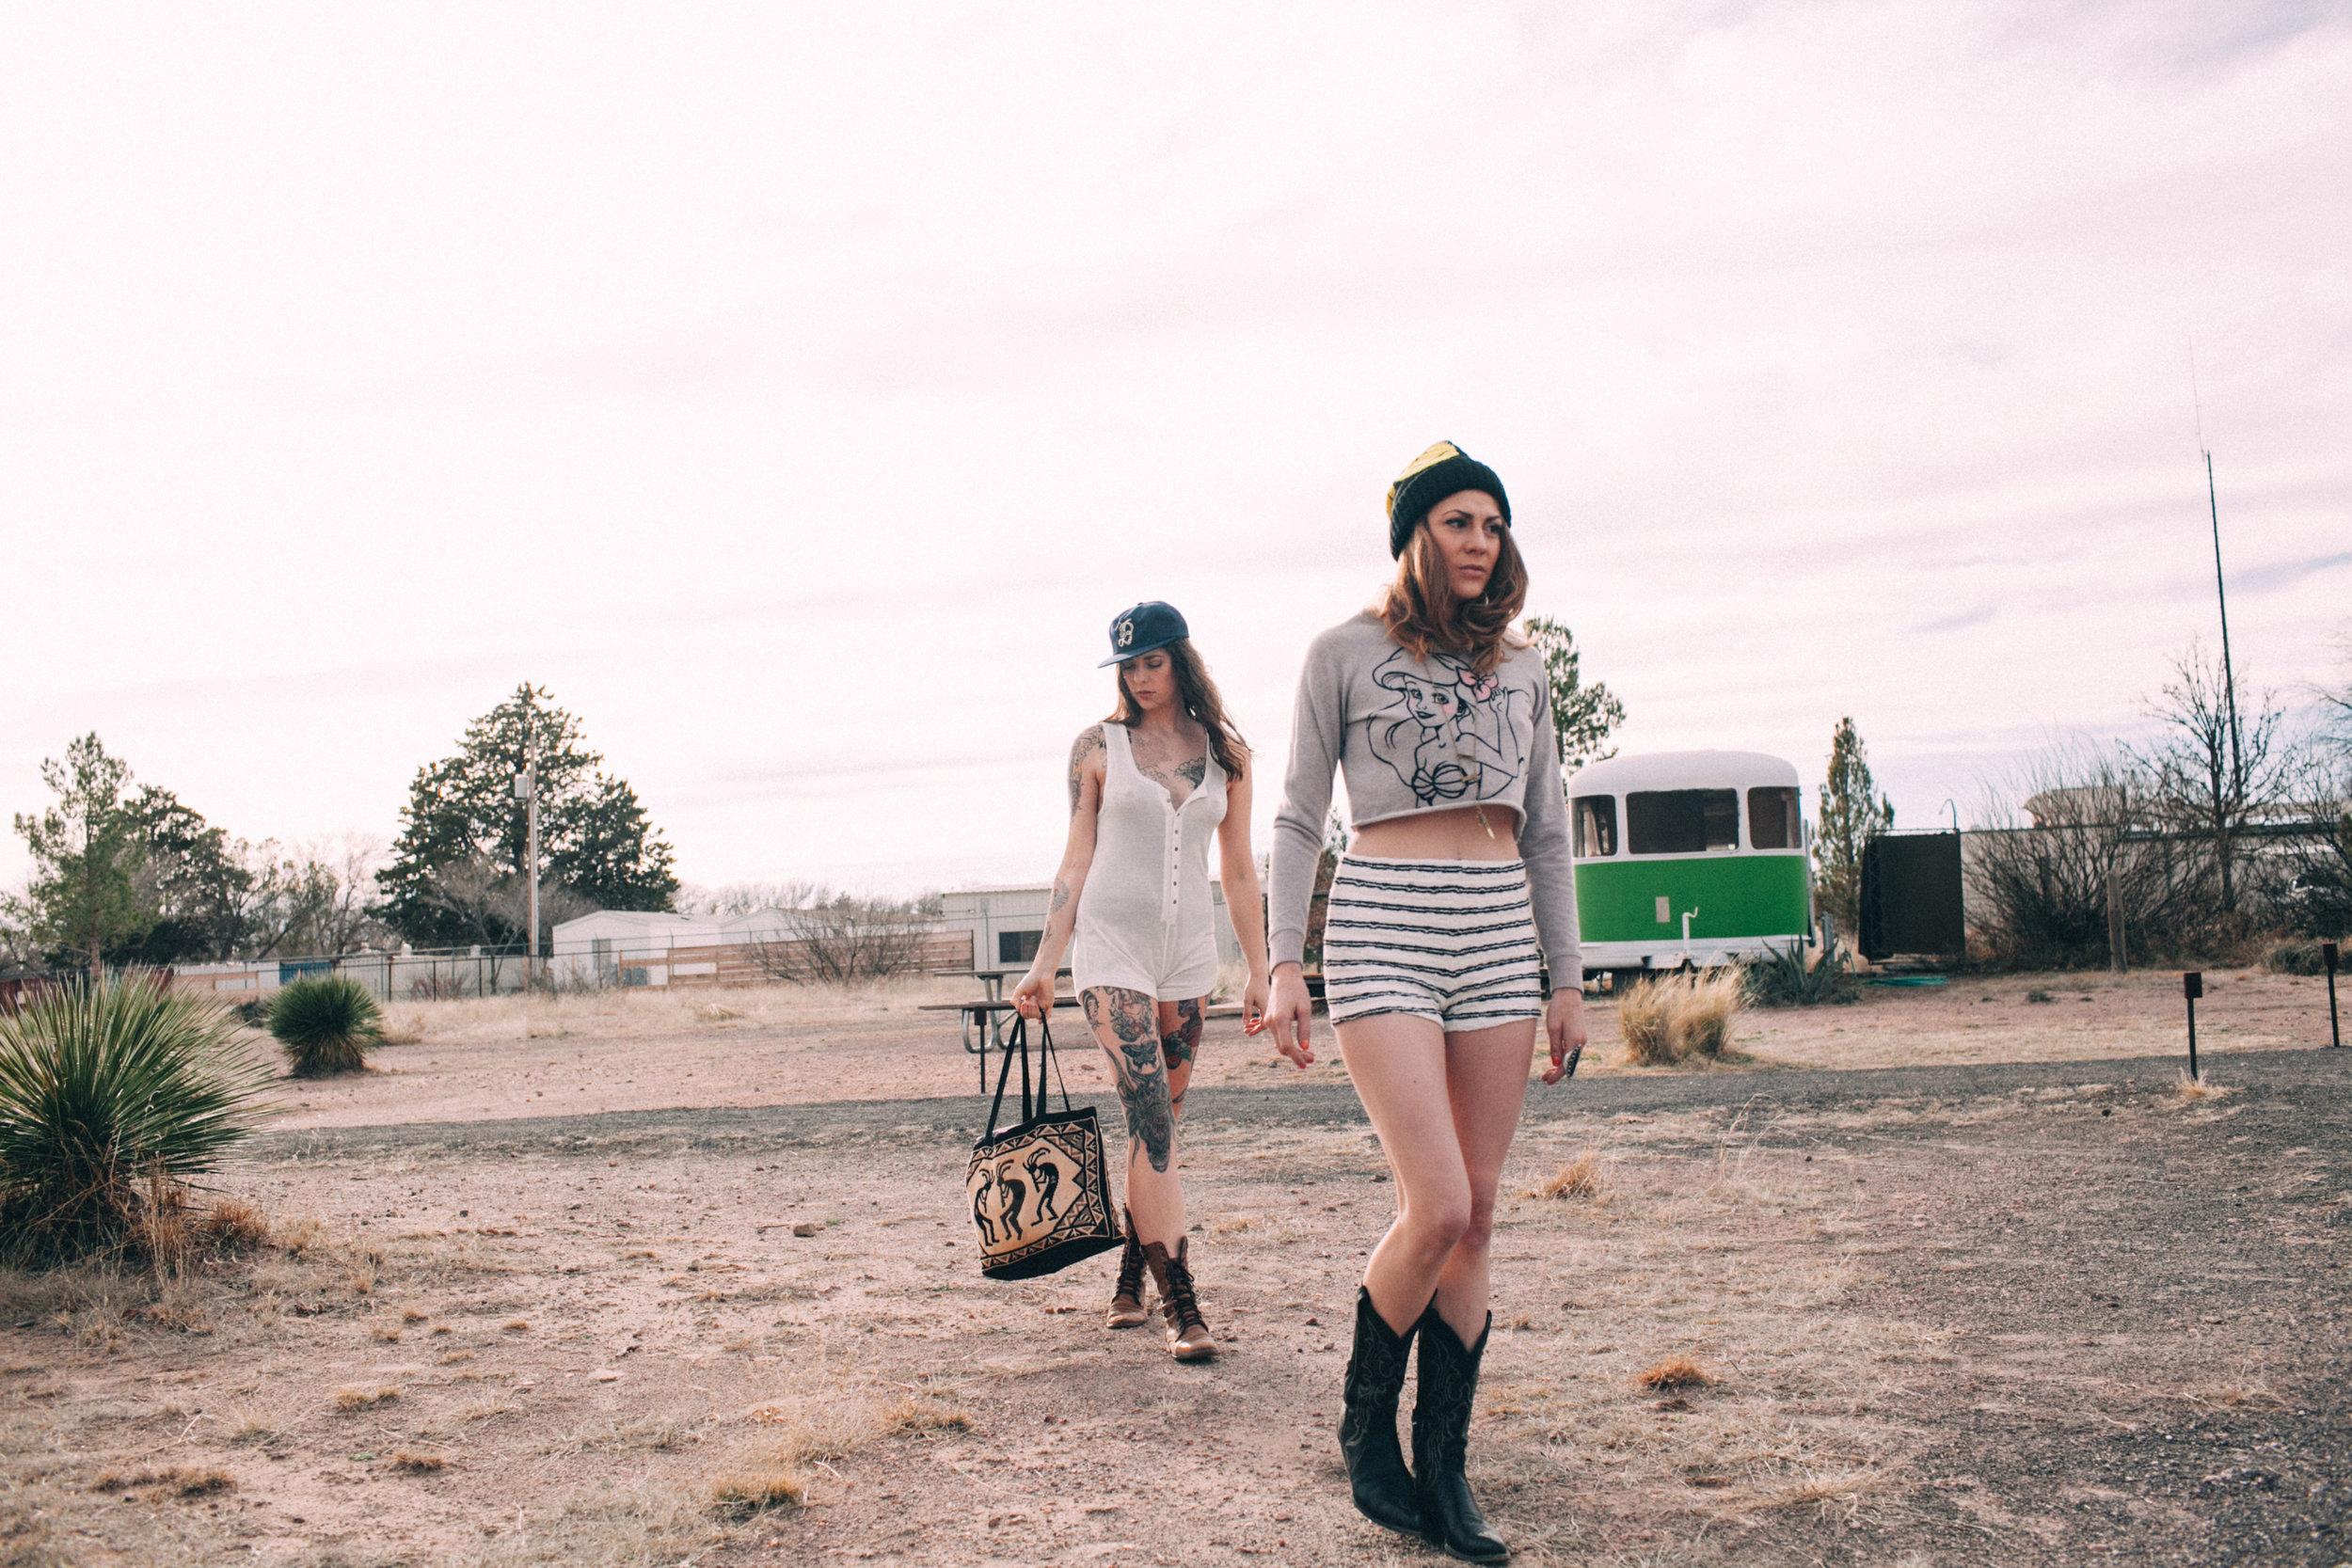 Marfa Texas Day 1 Chloe and Ashley 2015-101.jpg